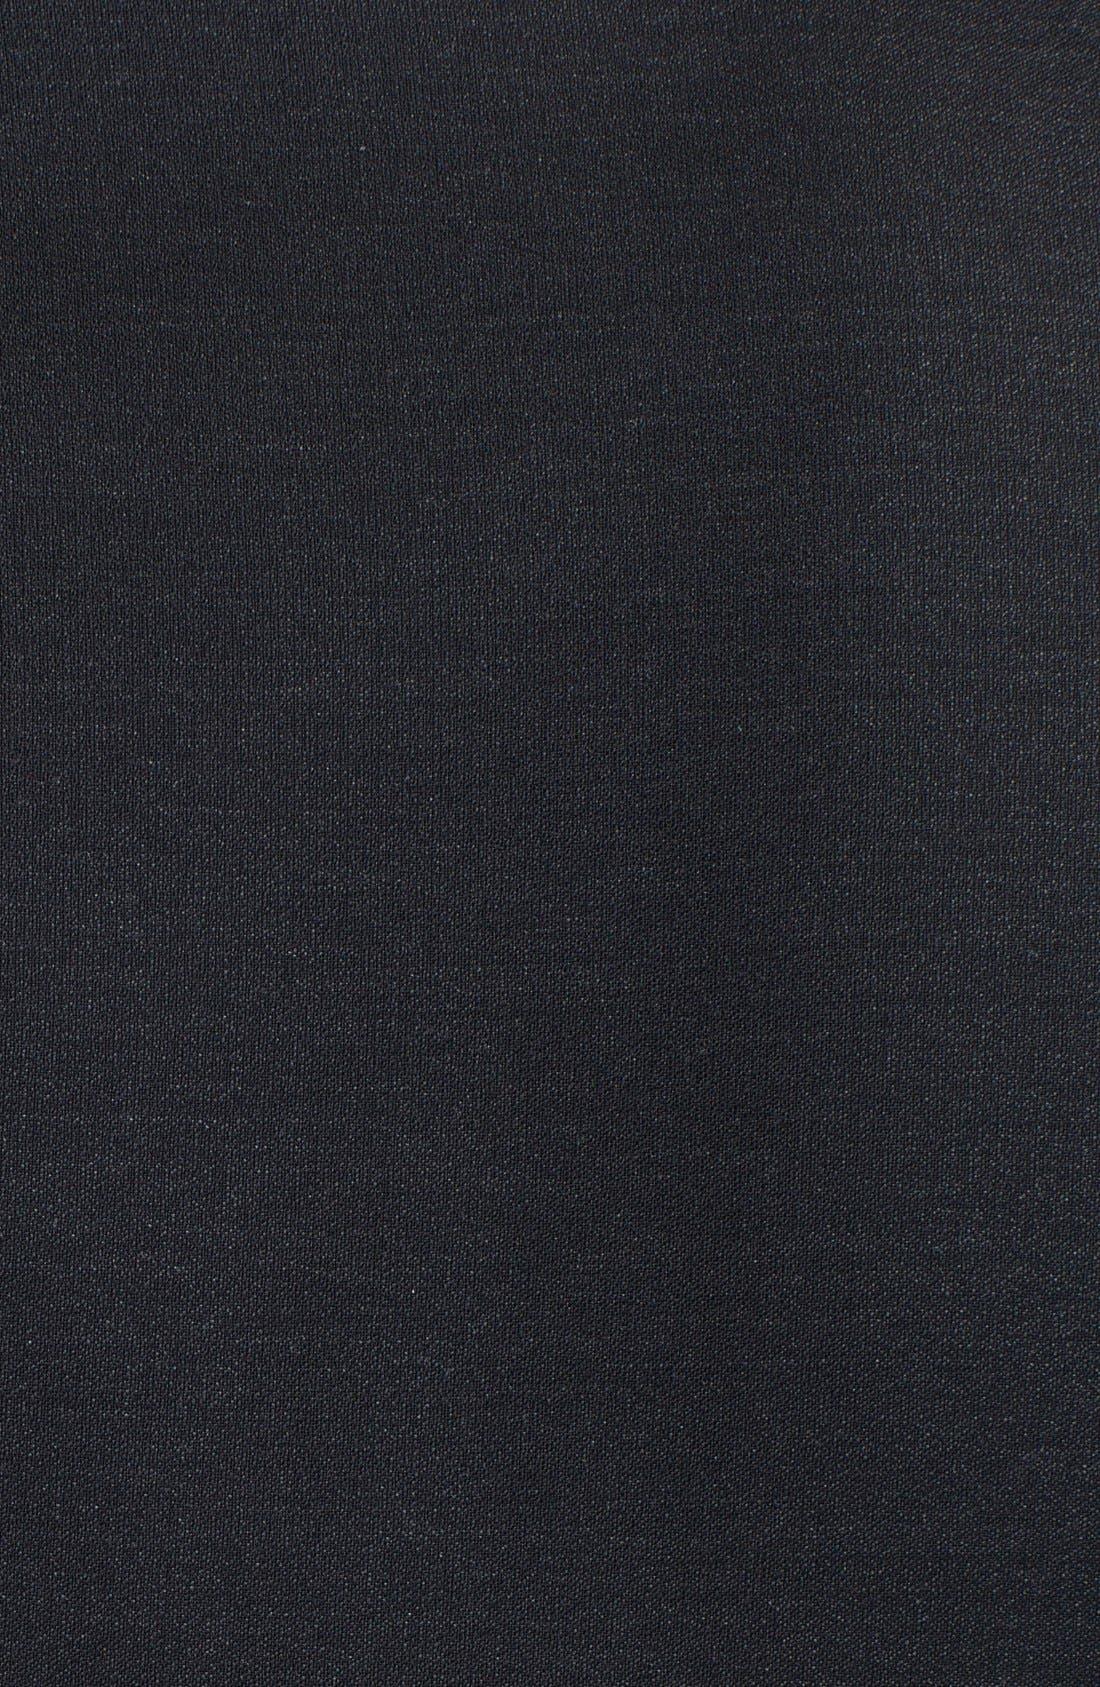 Alternate Image 5  - Lanvin 'Attitude' Black Wool Tuxedo